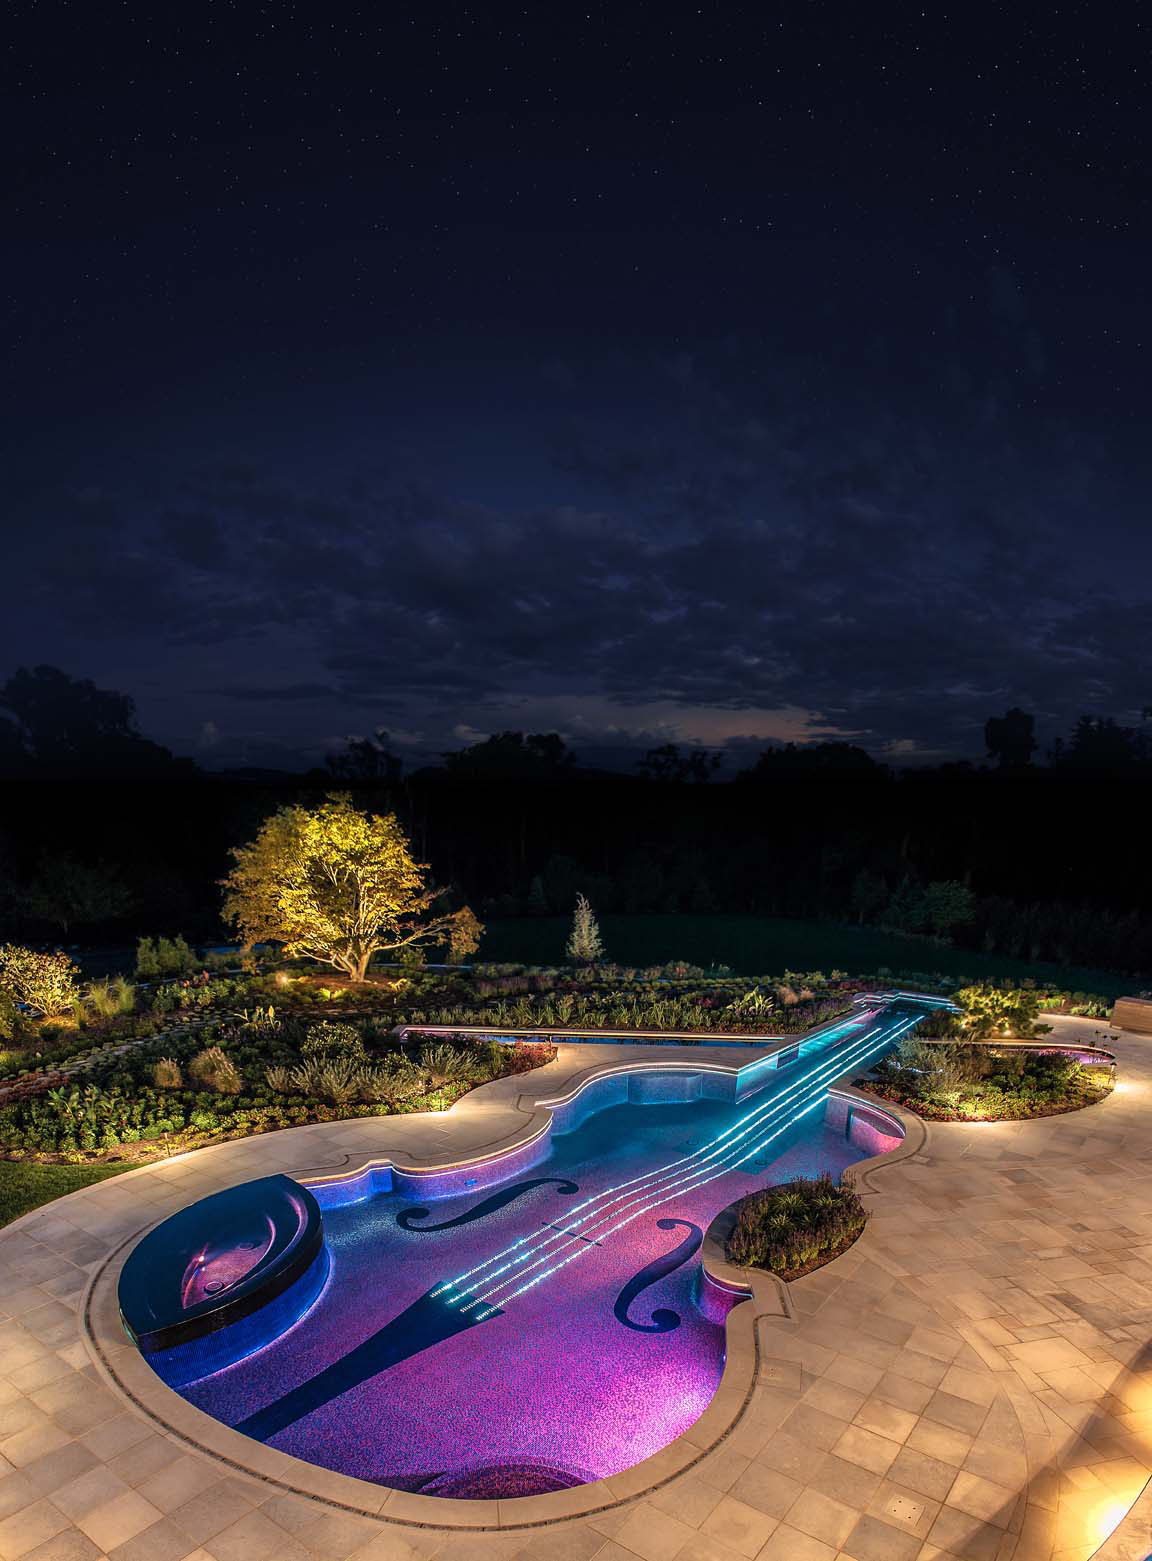 night lighting custom violin swimming pool vert Bedford NY Glass Tile Pool & Spa